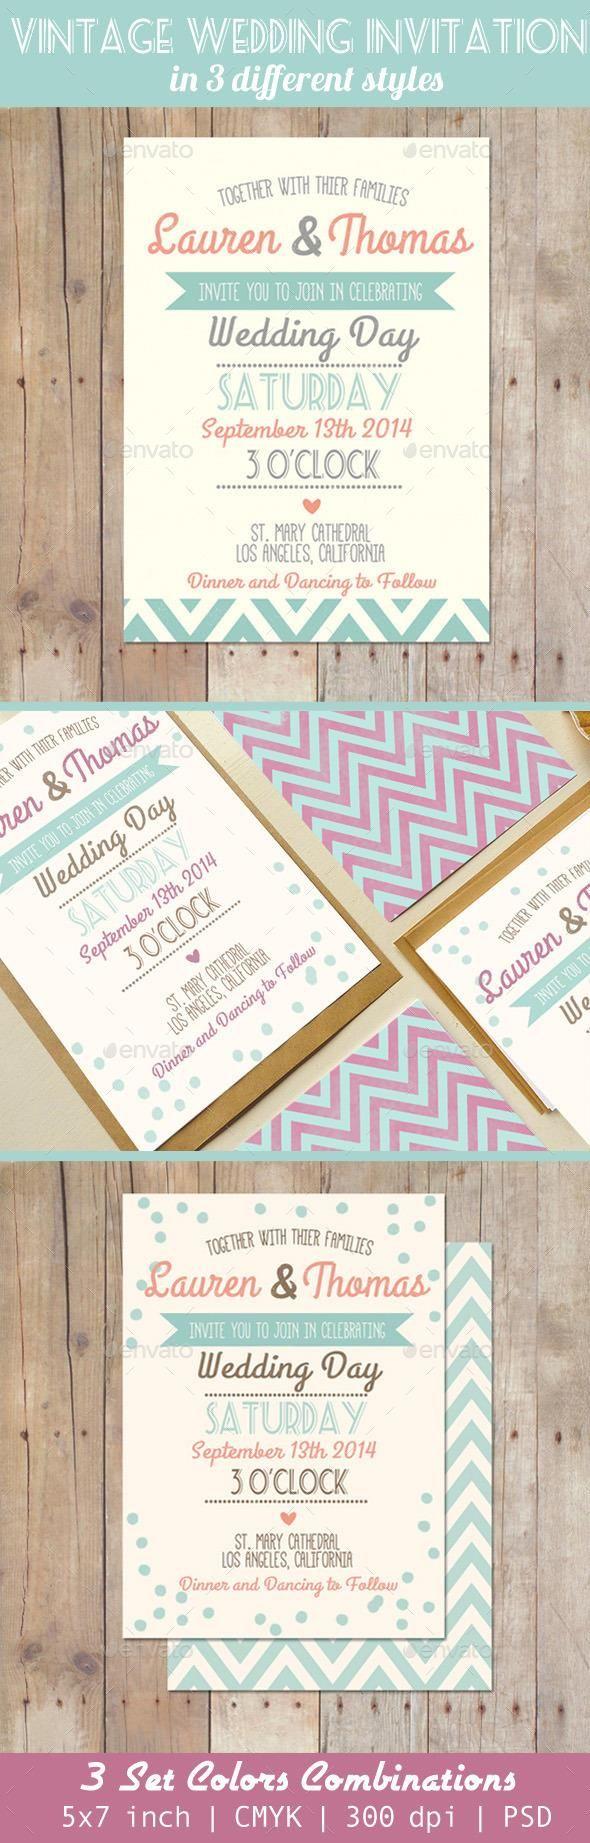 wedding invitation templates for muslim%0A Vintage Retro Wedding Invitations